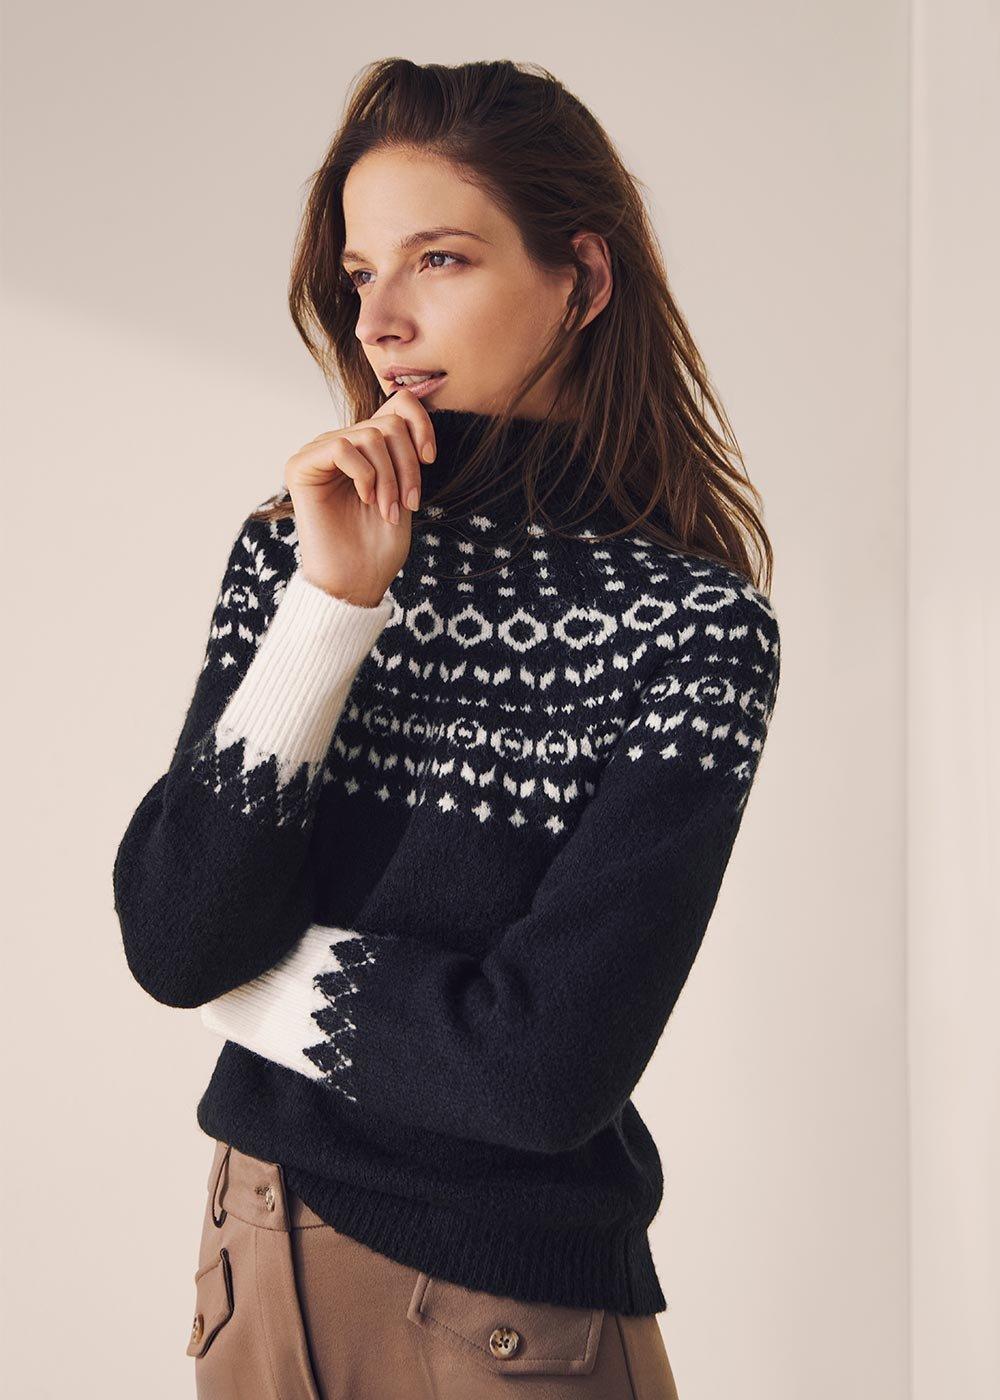 Mikela wool sweater with Norwegian pattern - Black / White / Multi - Woman